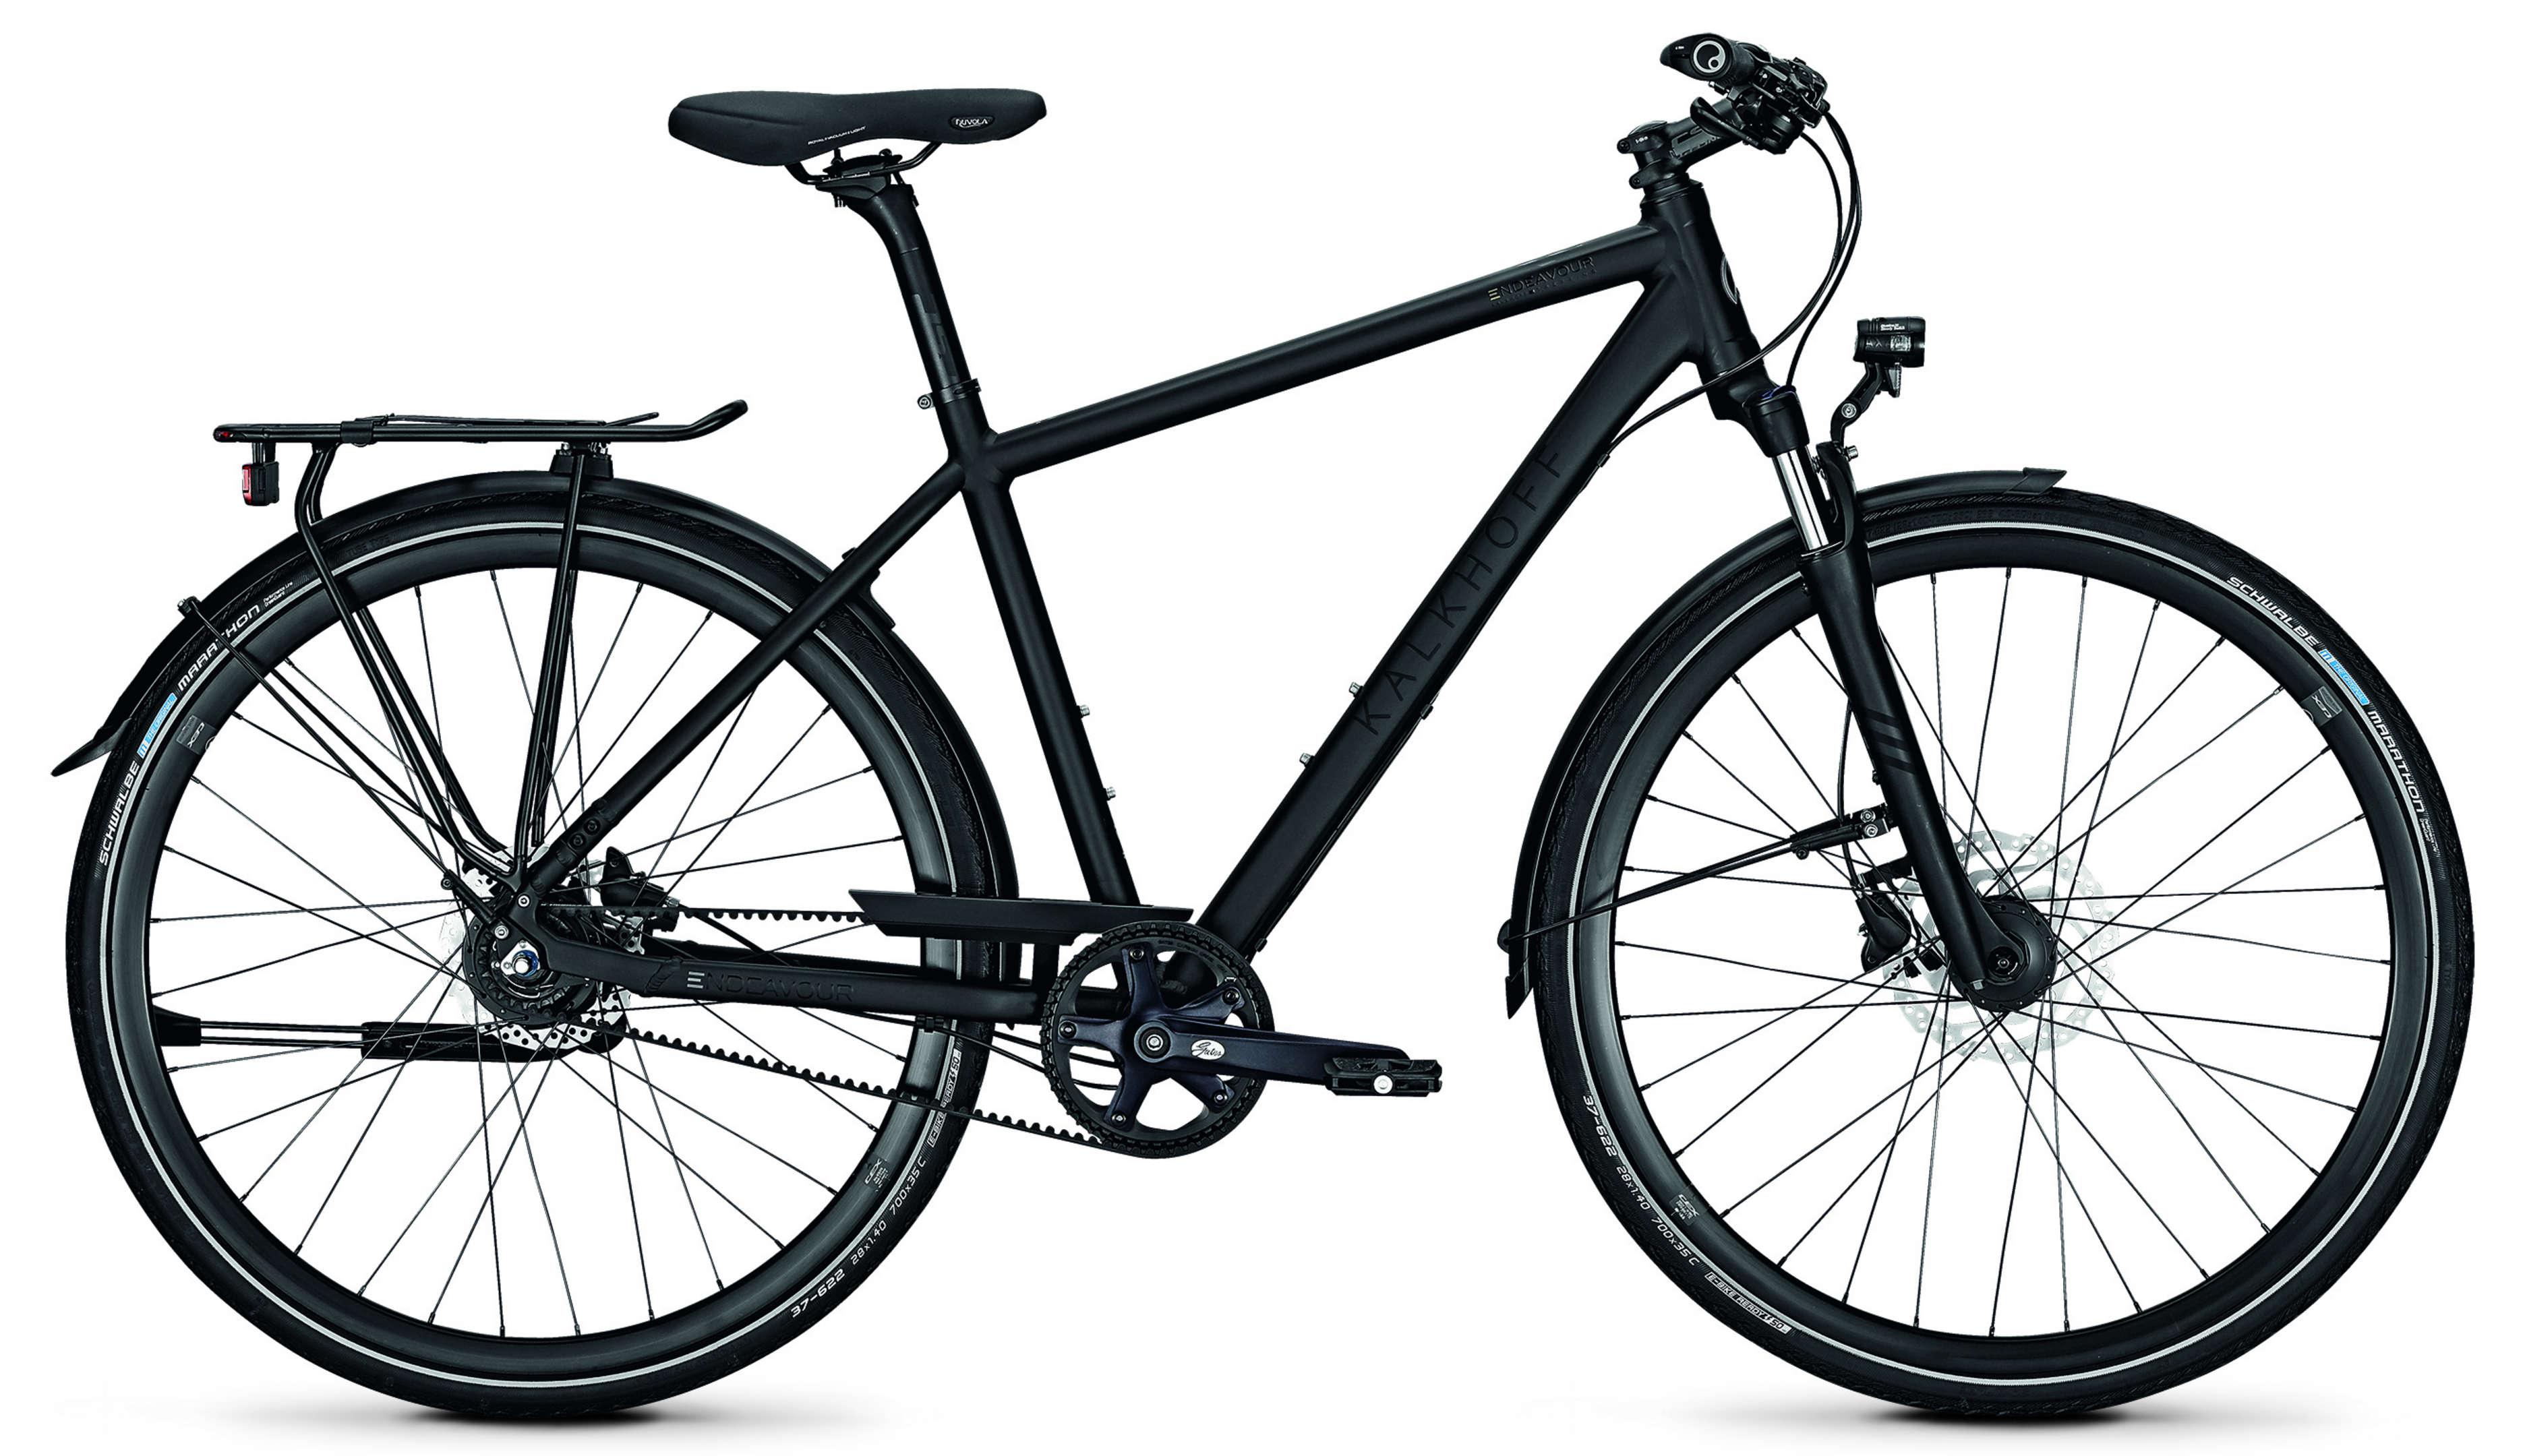 kalkhoff trekkingrad endeavour 8 eurorad bikeleasingeurorad bikeleasing. Black Bedroom Furniture Sets. Home Design Ideas